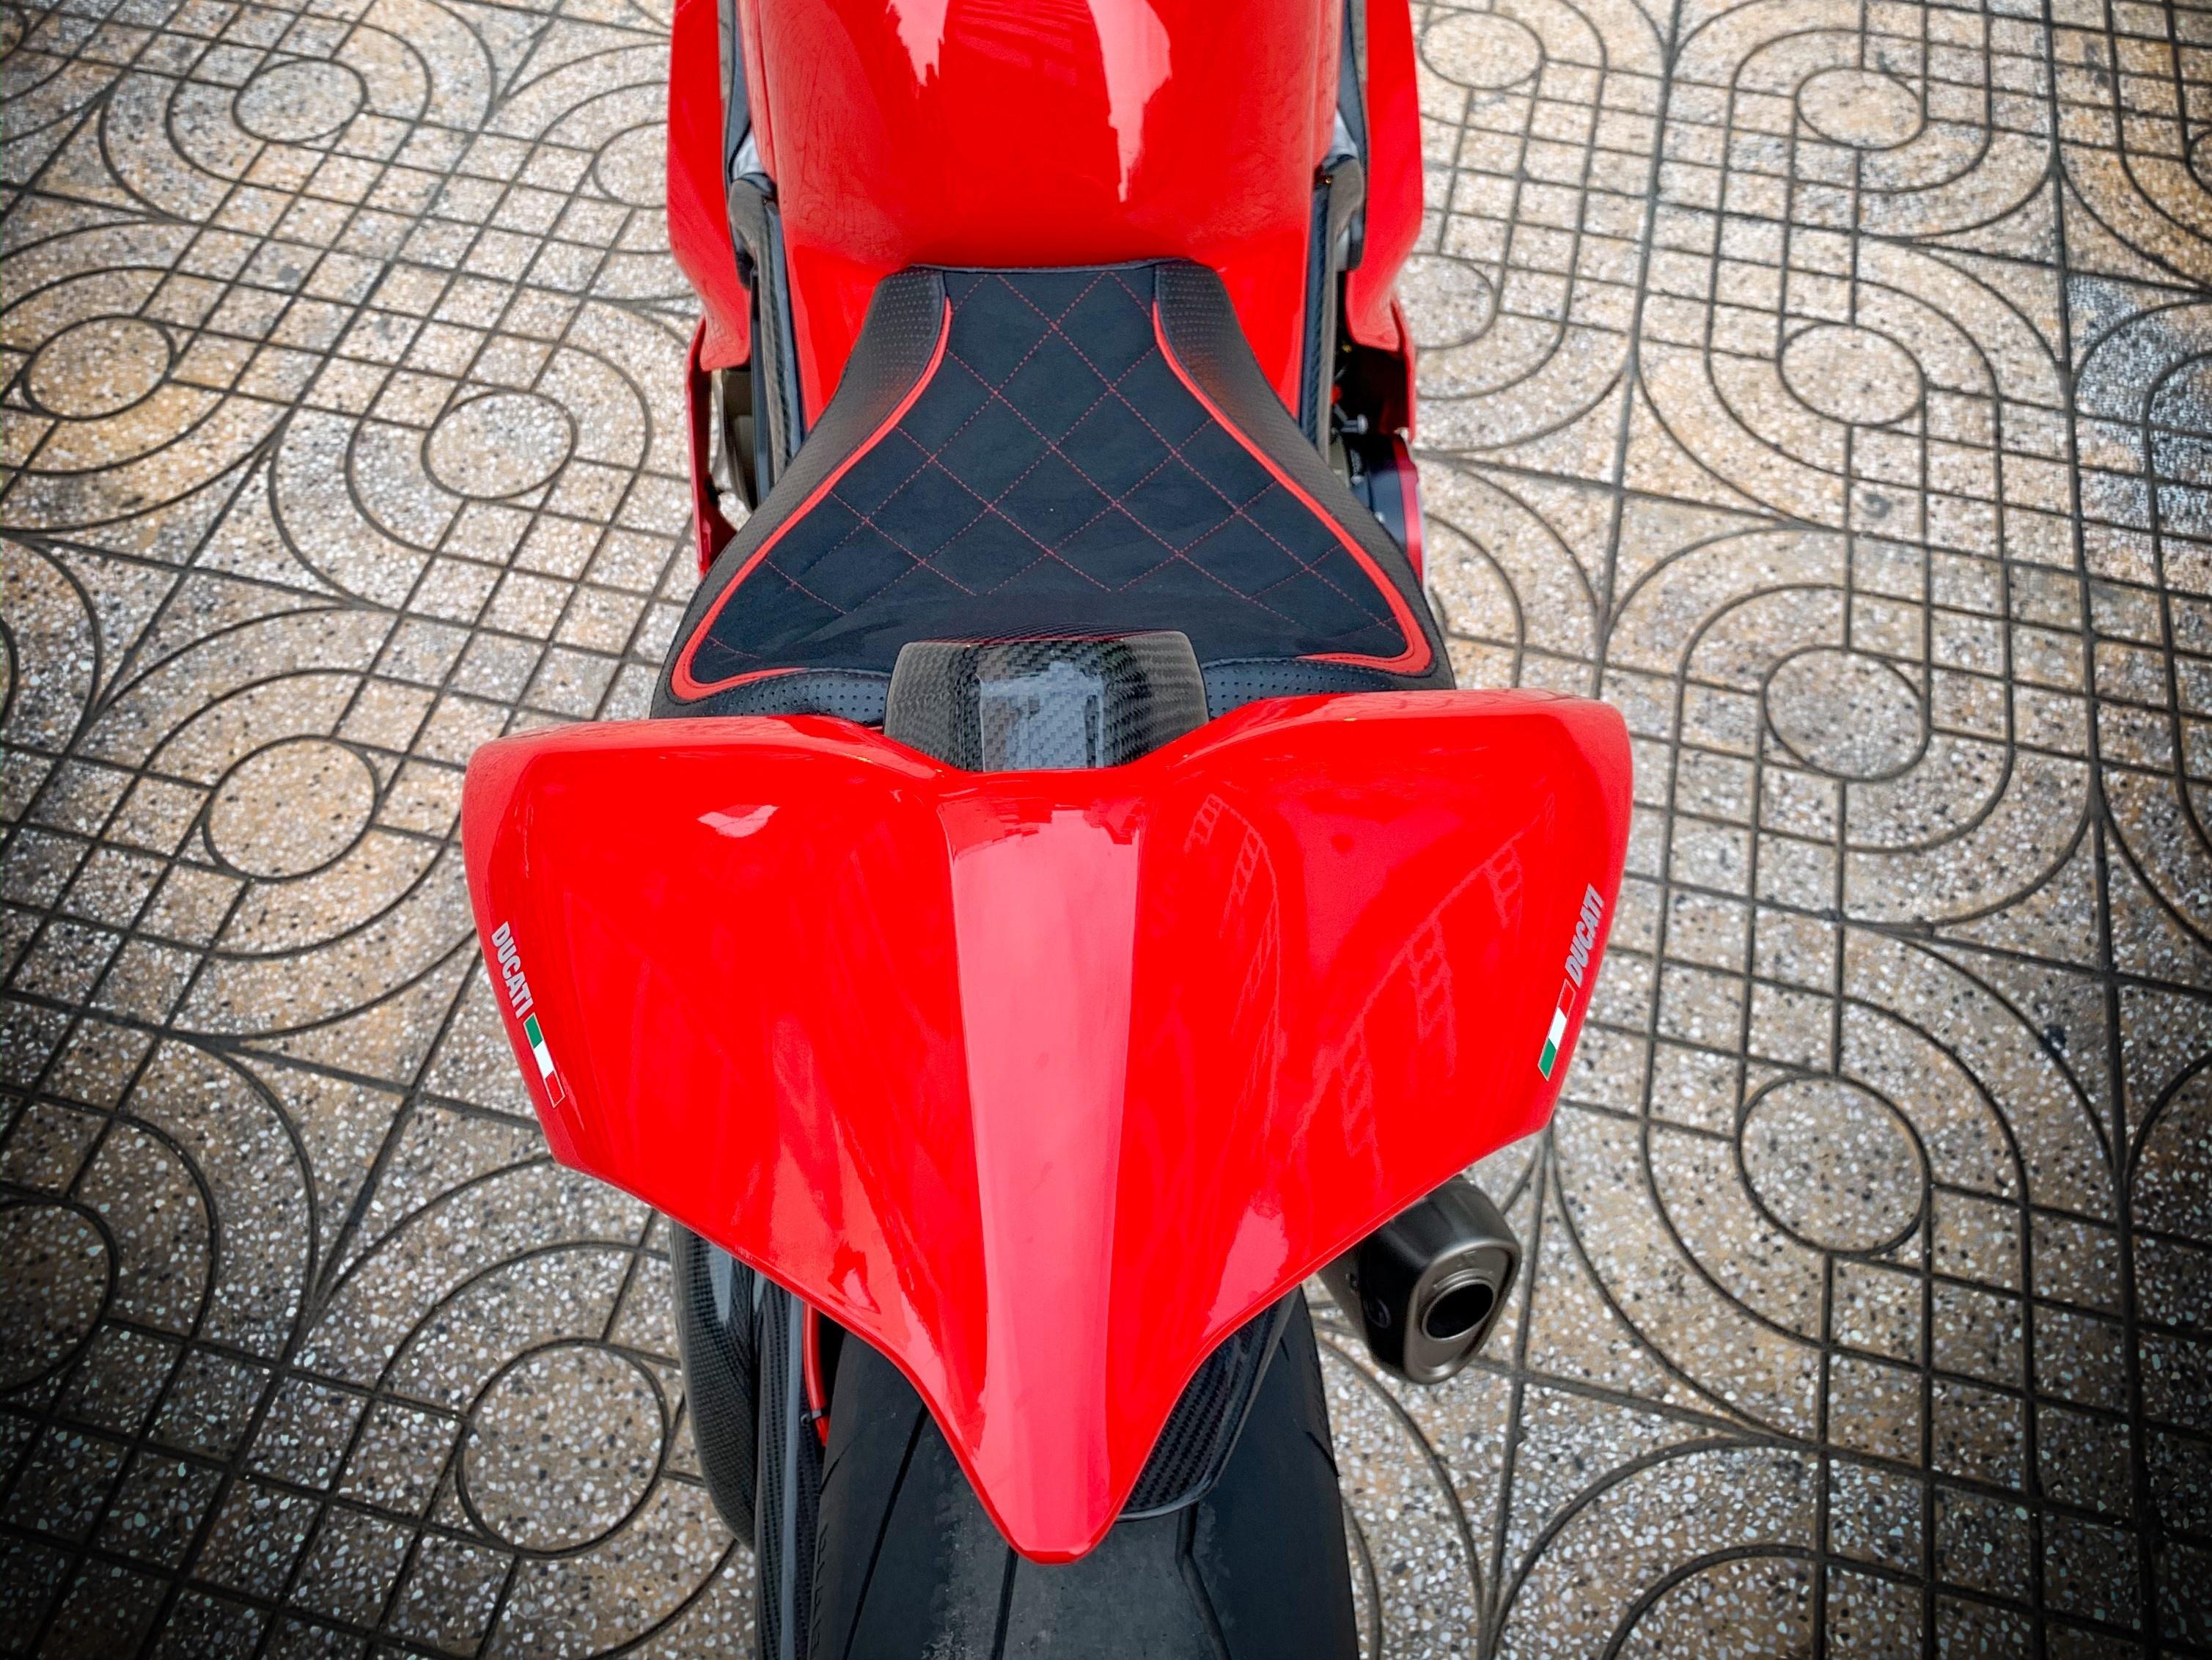 Moto tien ty Ducati Panigale V4 S voi goi do dat gia tai TP.HCM hinh anh 20 V4_13.jpeg